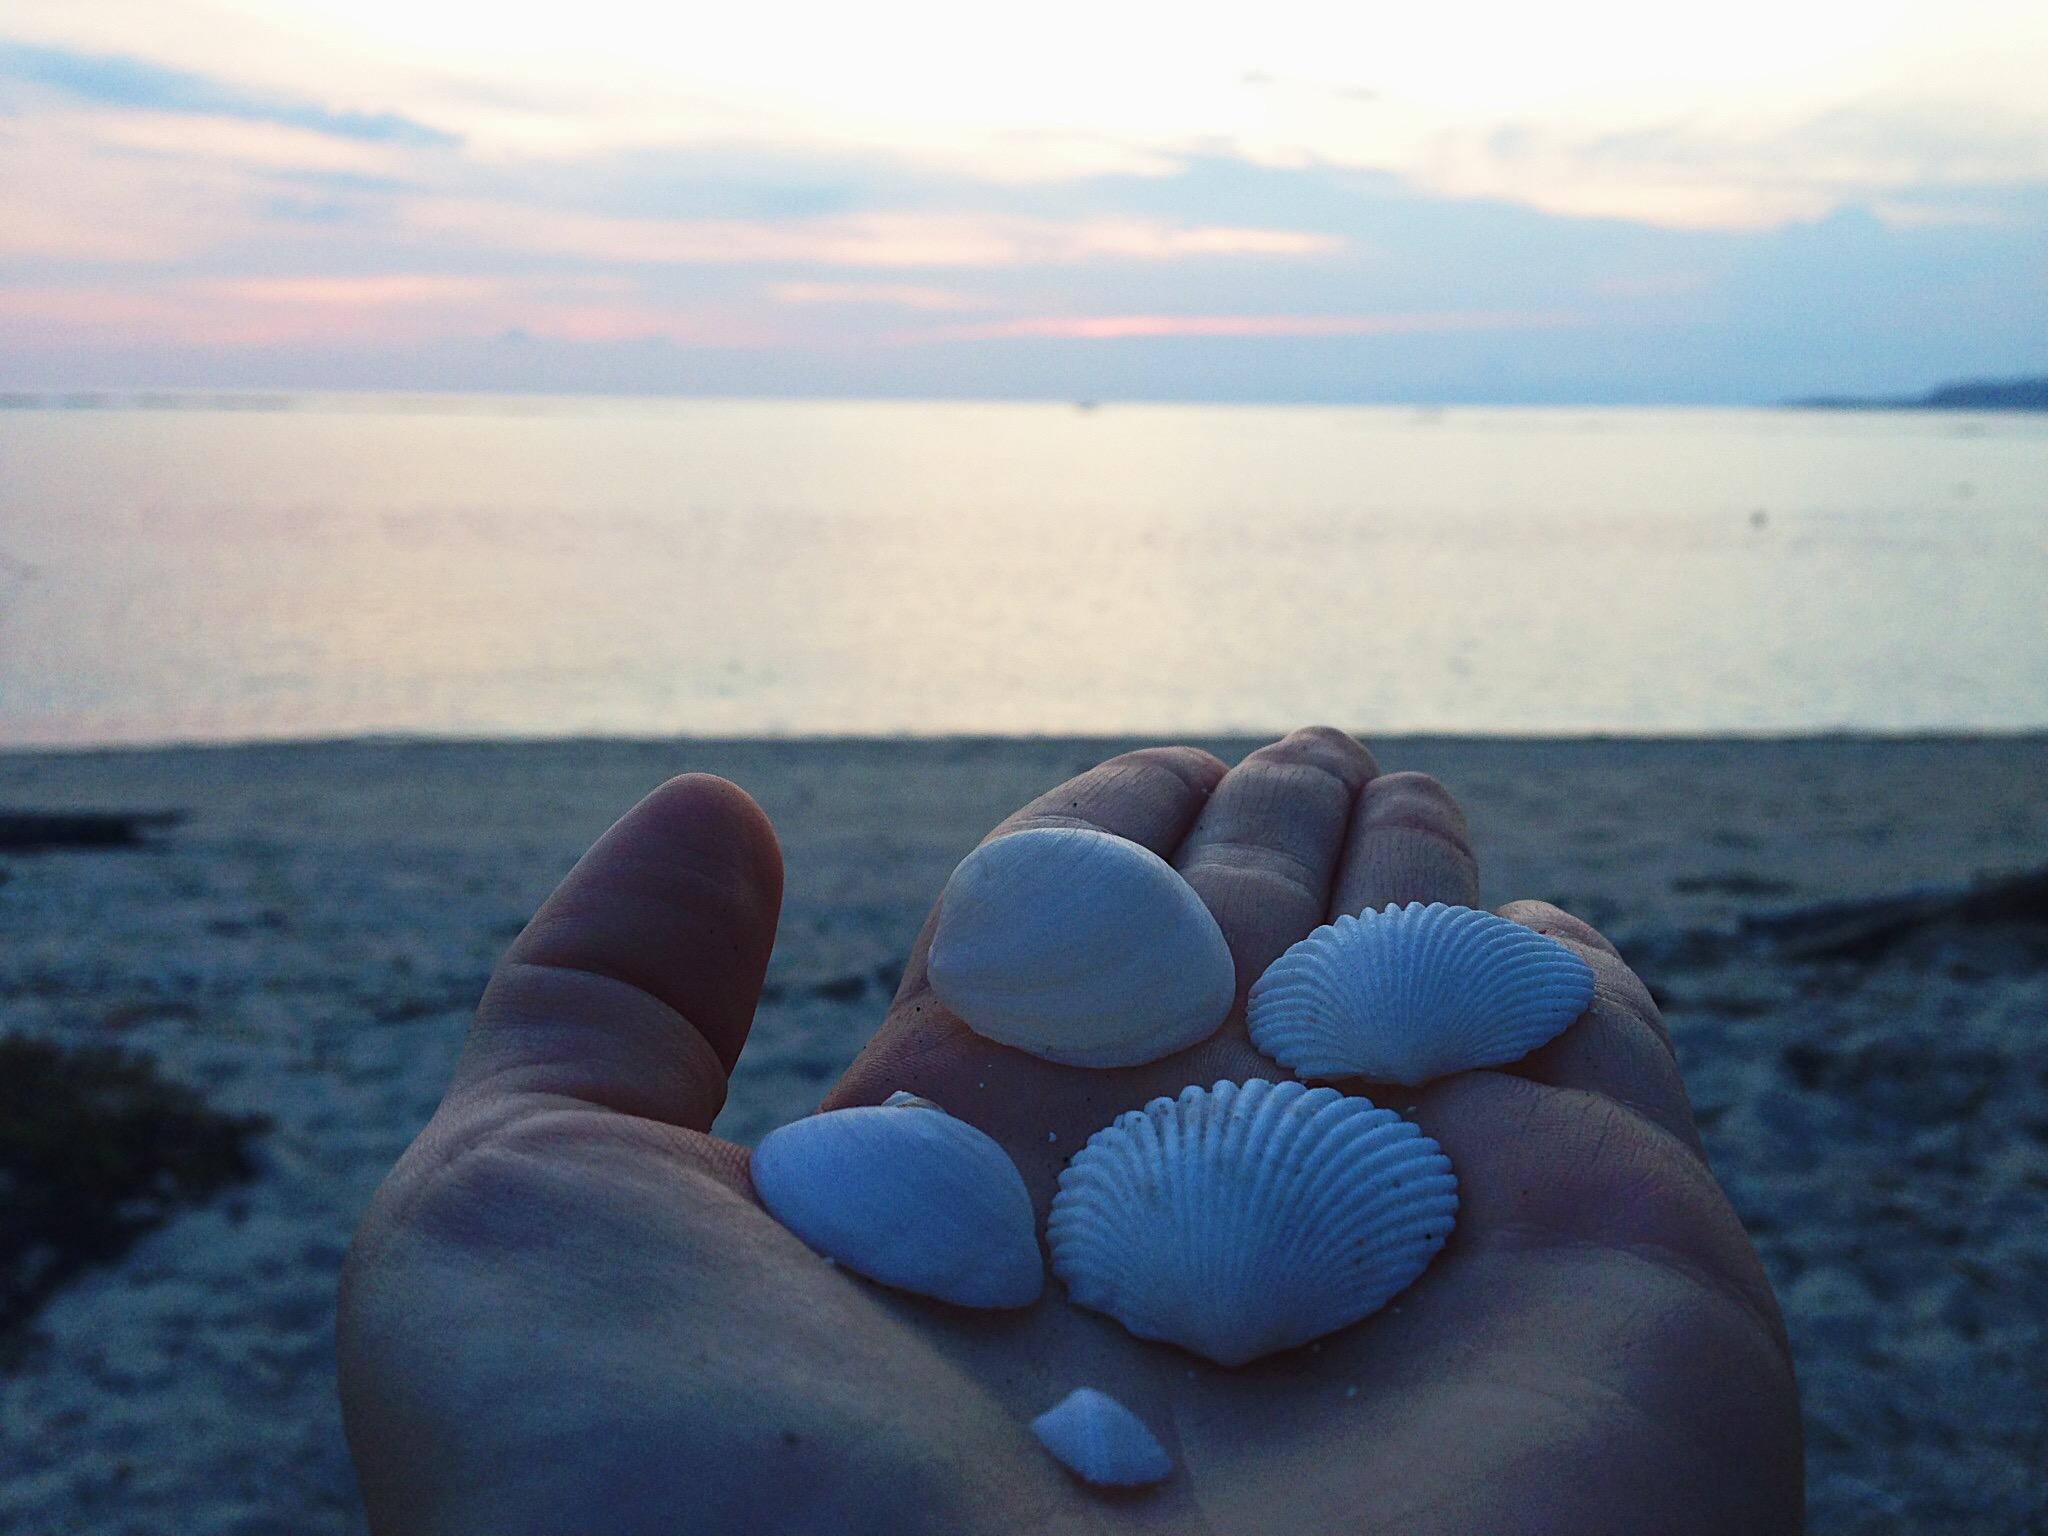 coquillages-sunset-gili-air.JPG